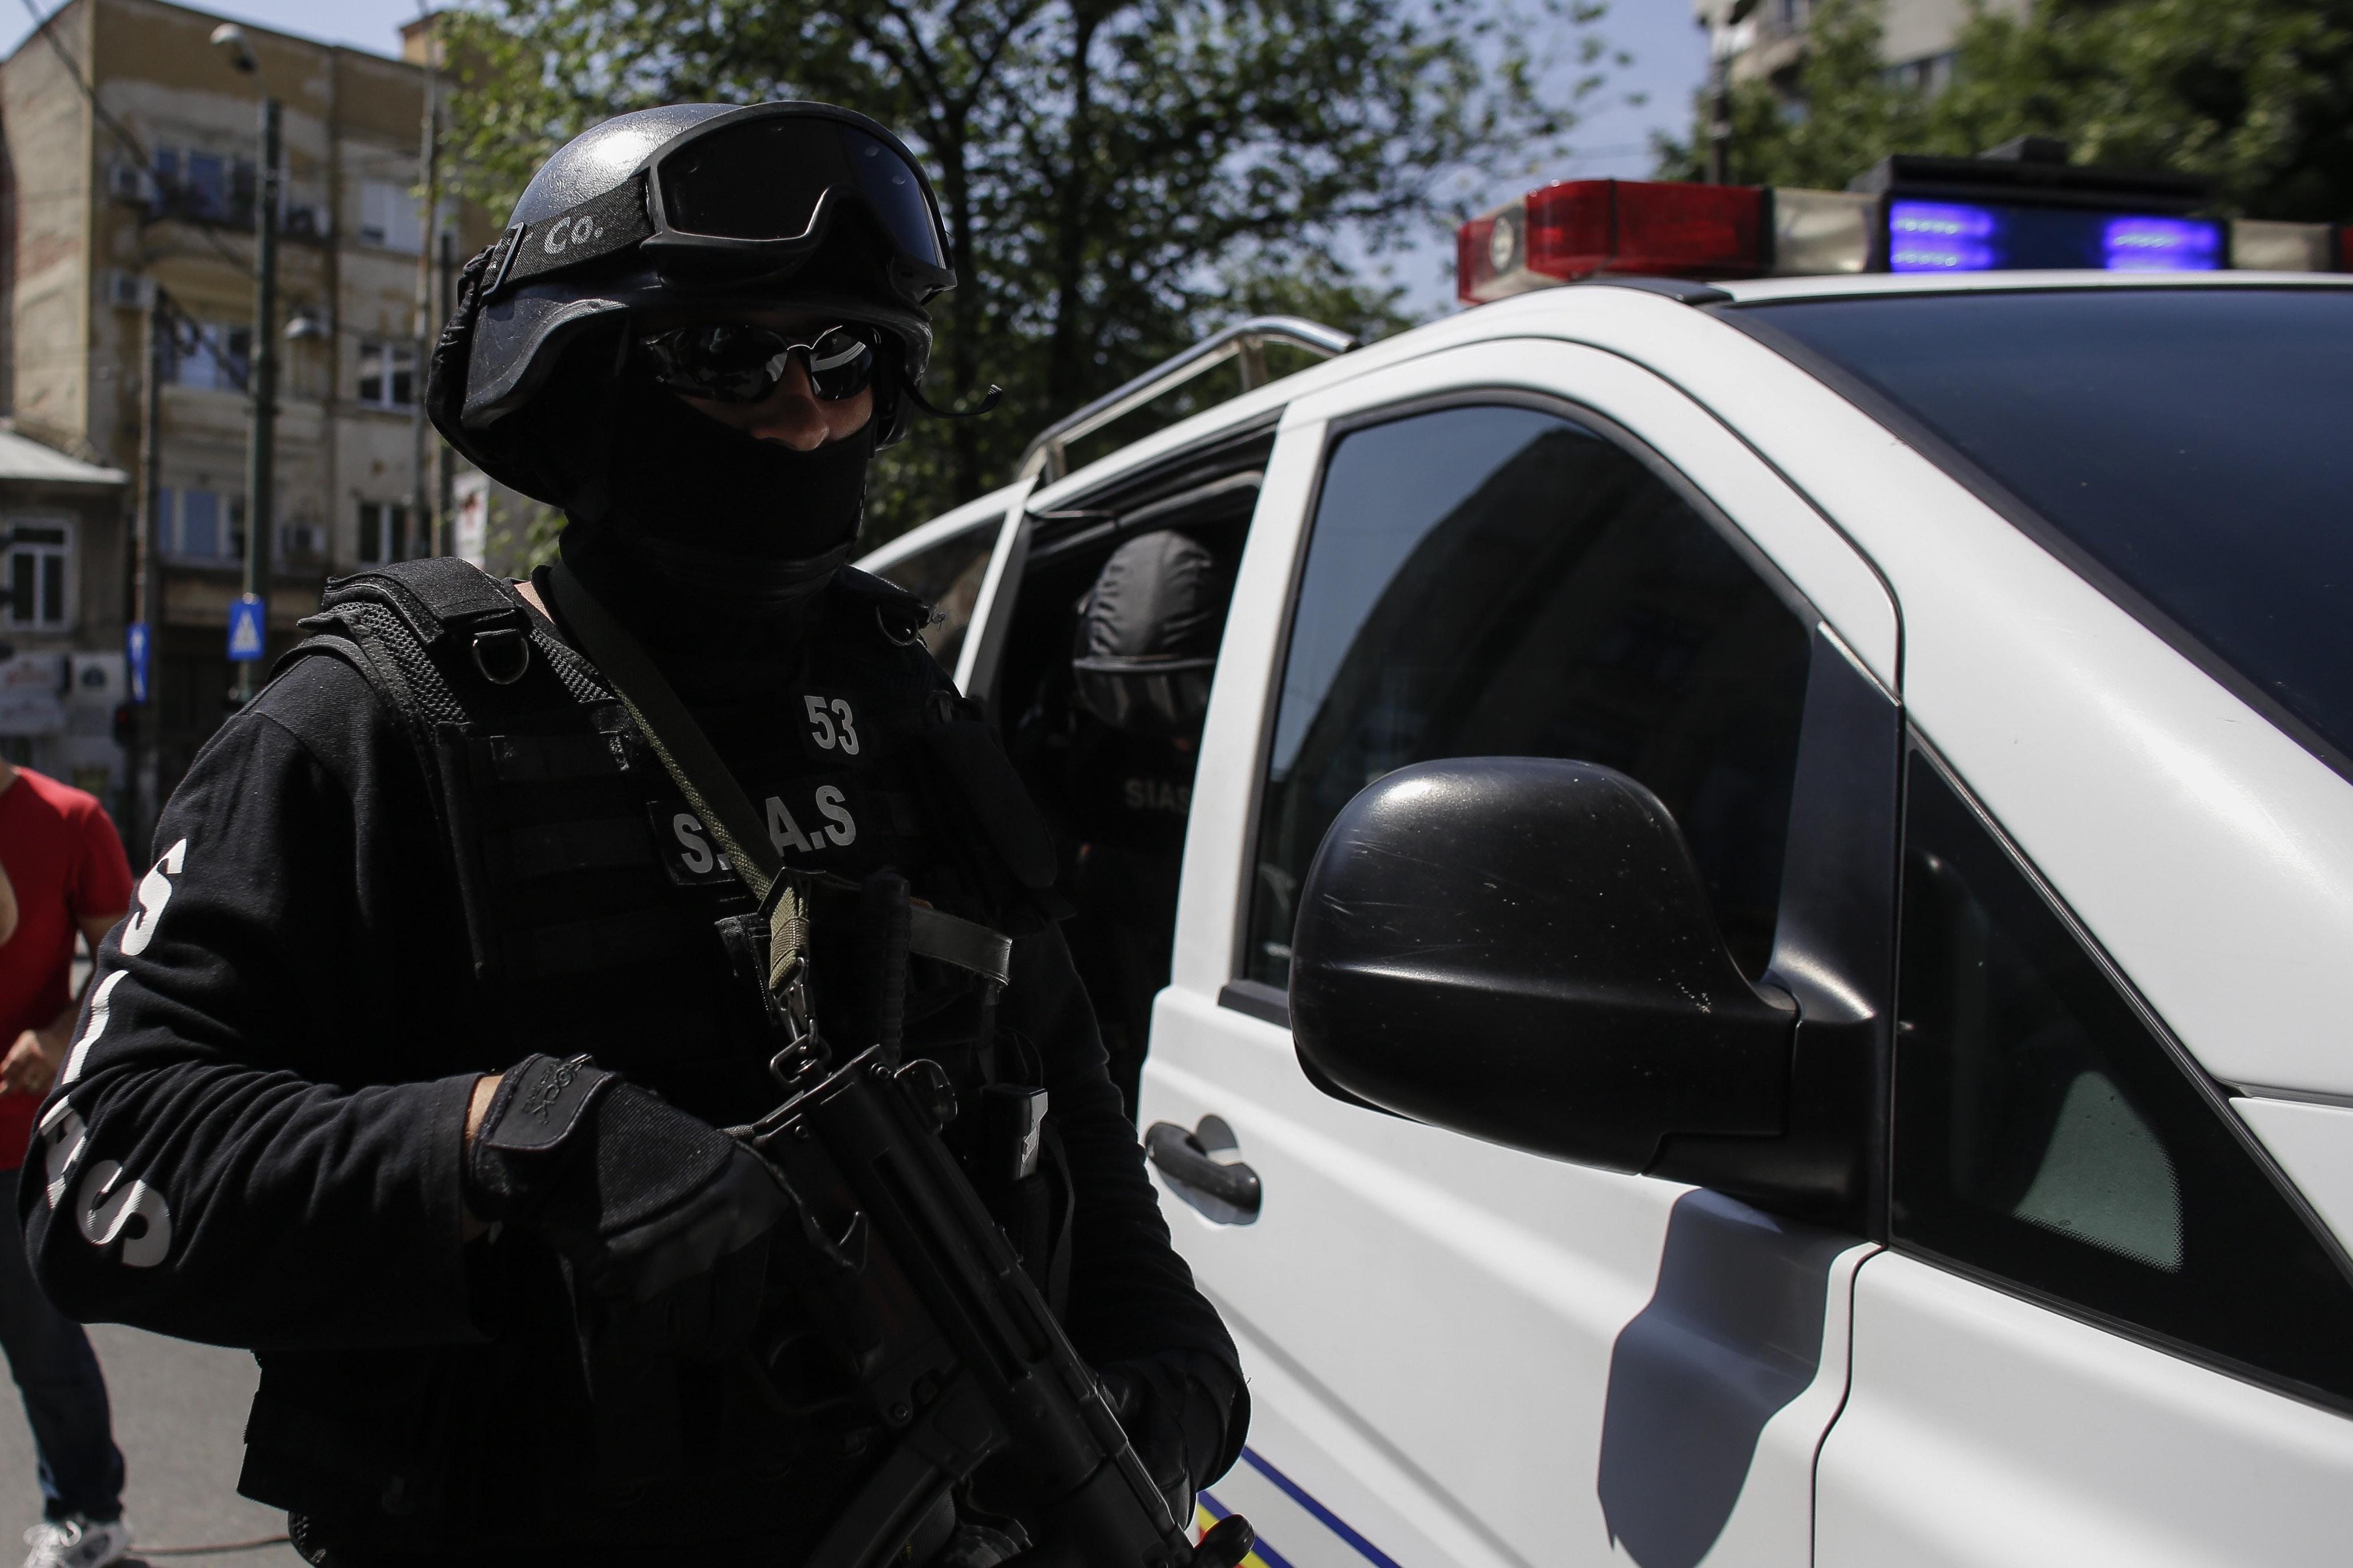 OFICIAL. Romania, implicata in ancheta teroristului din Noua Zeelanda